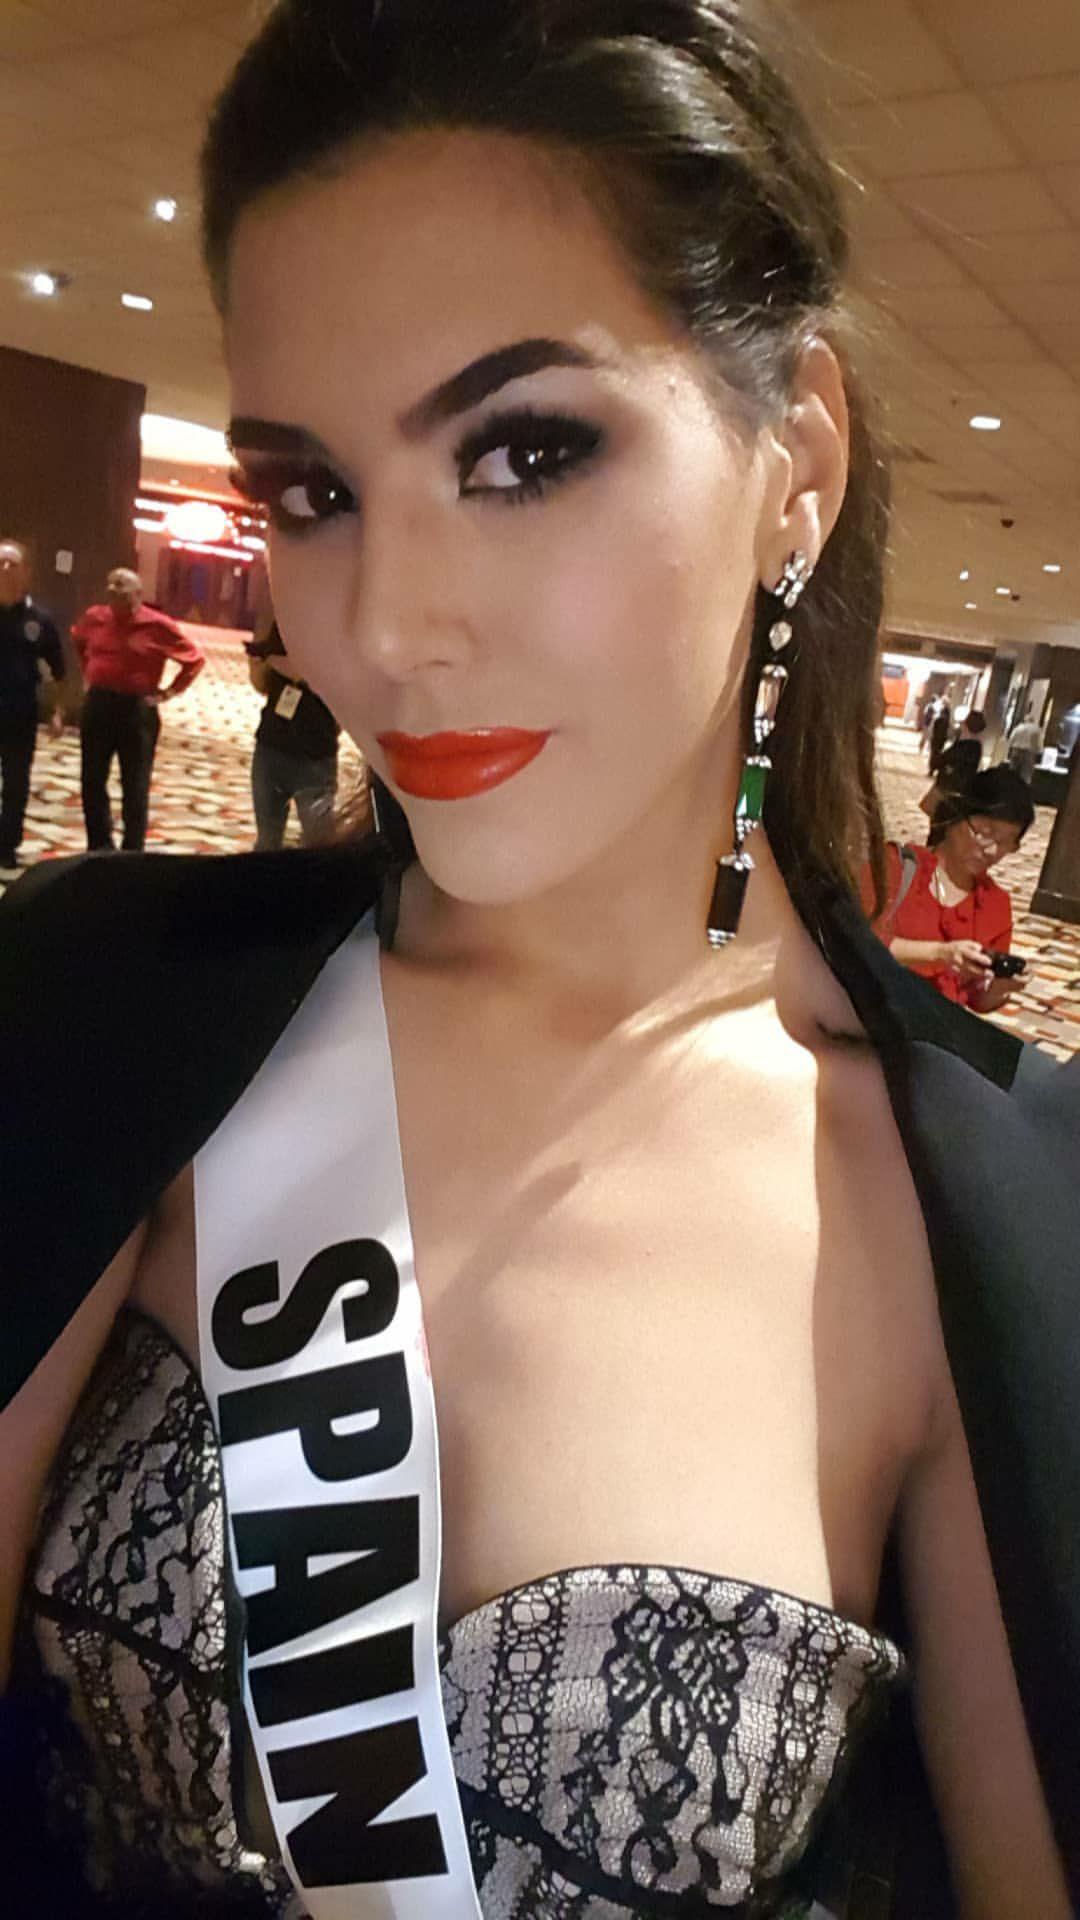 sofia del prado, top 10 de miss universe 2017/reyna hispanoamericana 2015/miss charm spain 2021. - Página 7 56960055_23593688_933122593495196_8439223337368837889_o